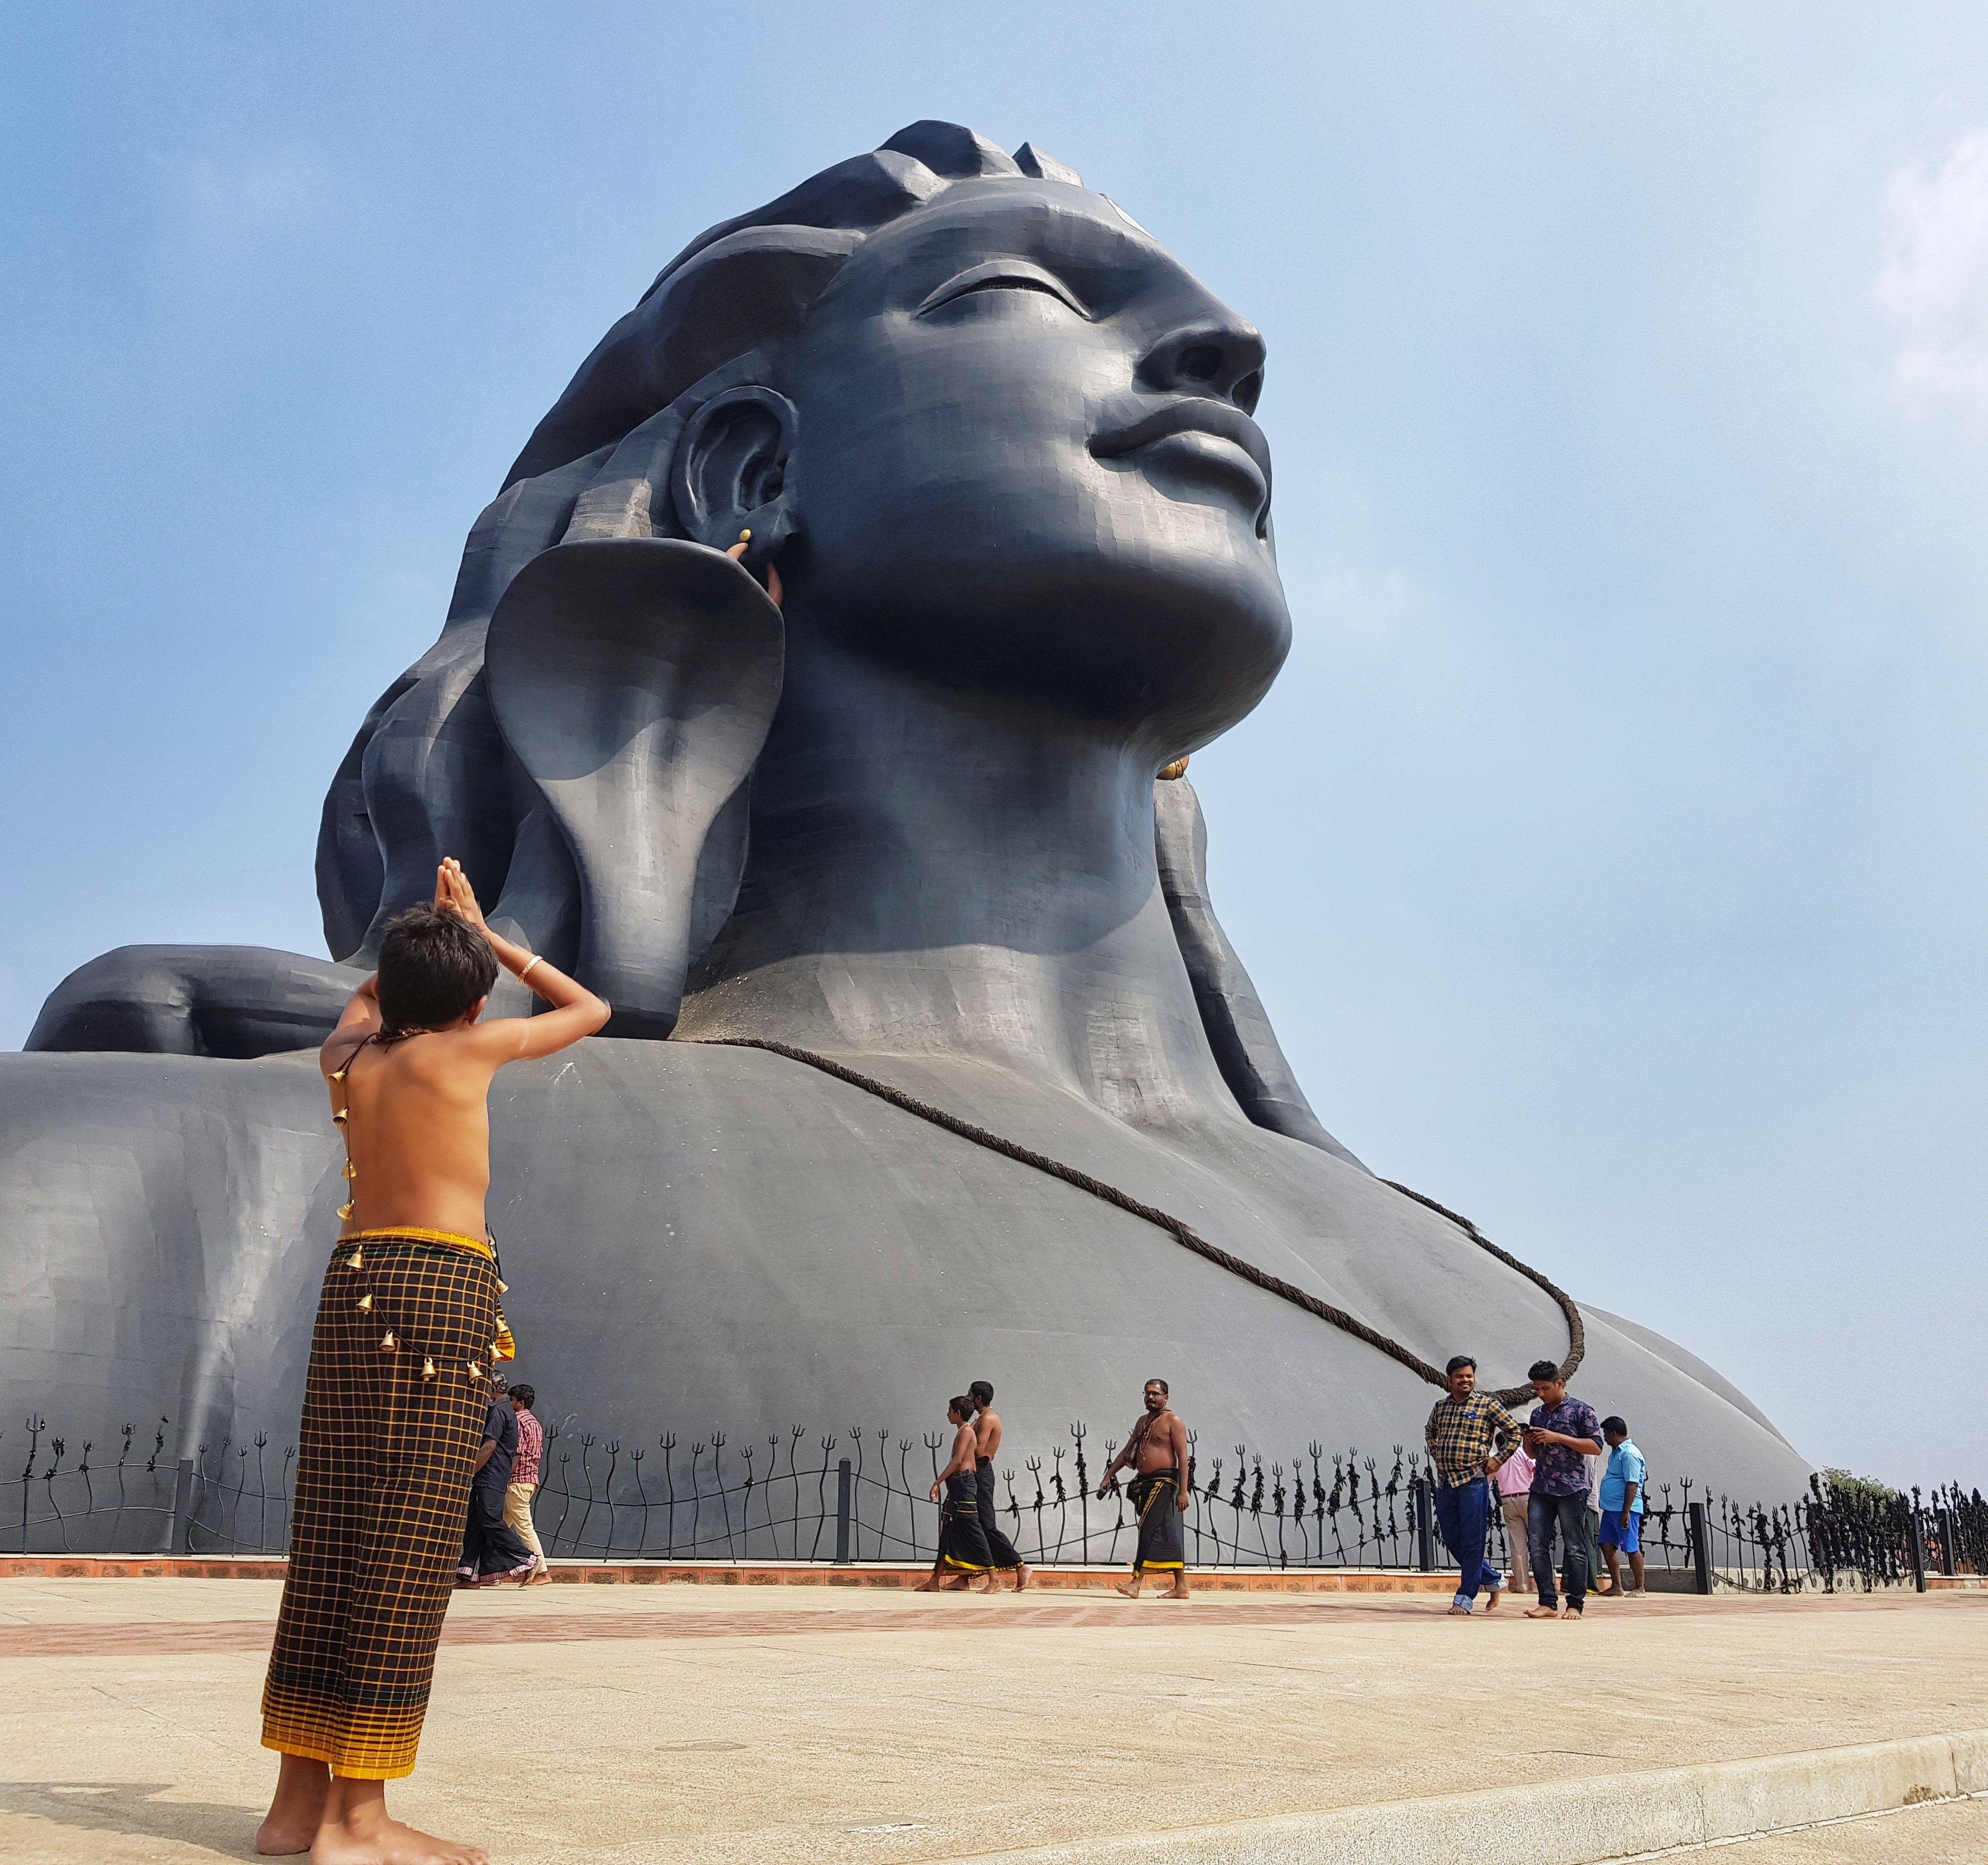 60 Shiva Adiyogi Wallpapers Hd Free Download For Mobile And Desktop In 2020 Shiva Wallpaper Shiva Shiva Art